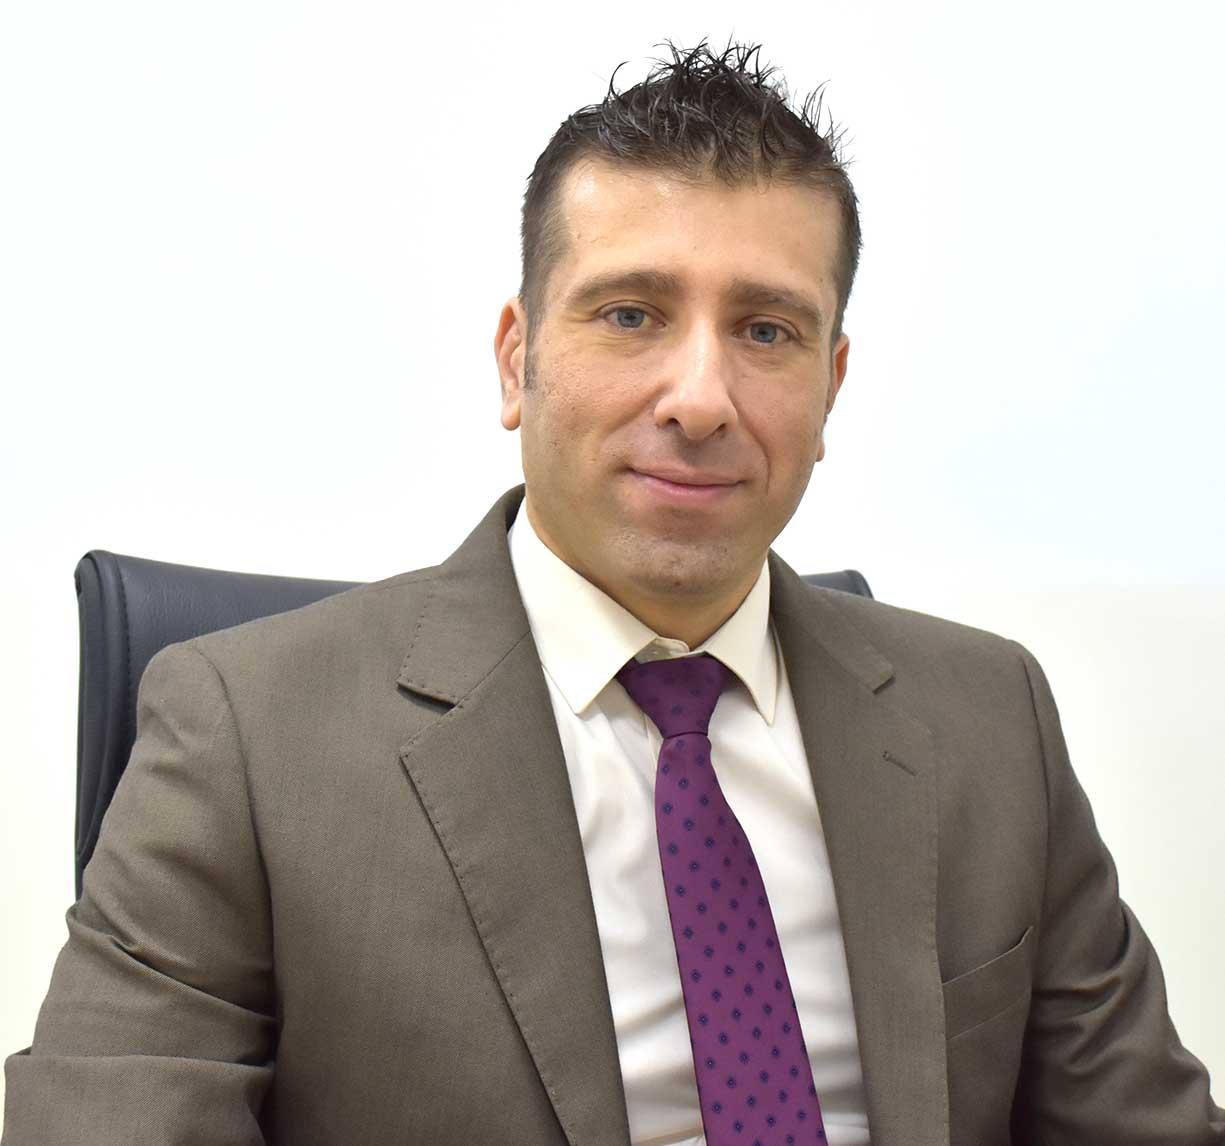 Bassam Saryeddine